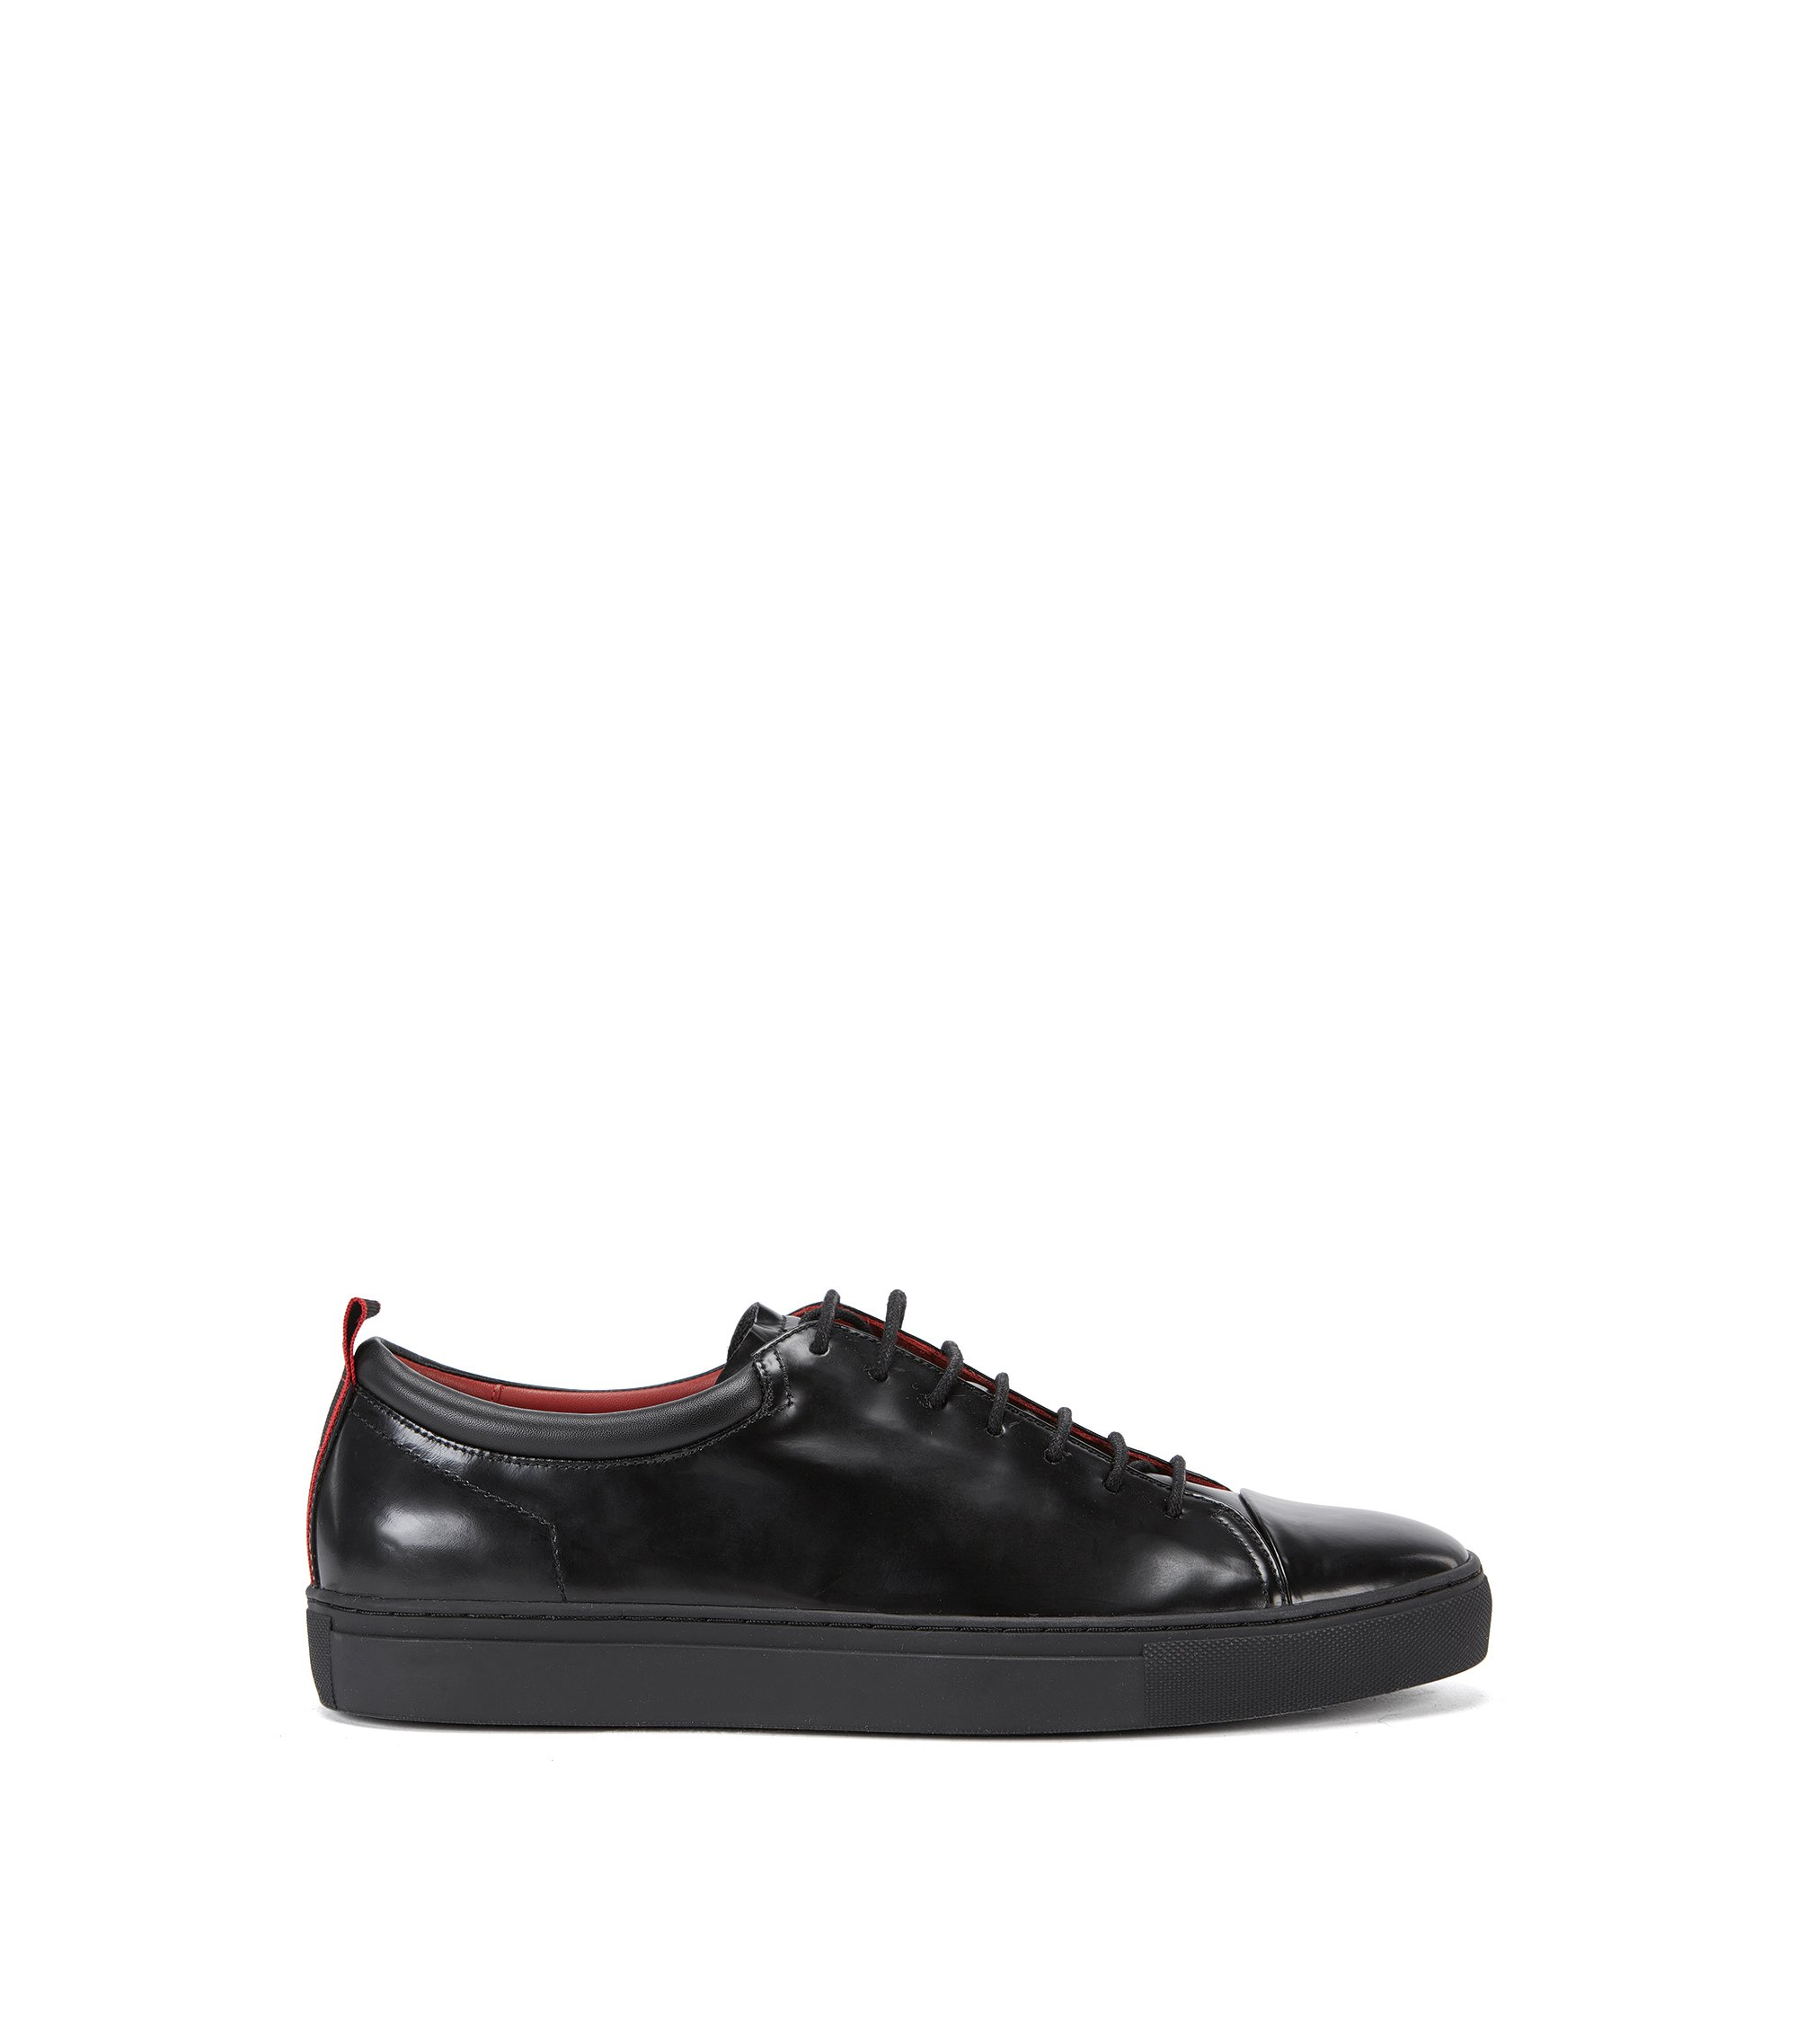 Leather Tennis Shoe | Casual Fut Tenn Boct, Black